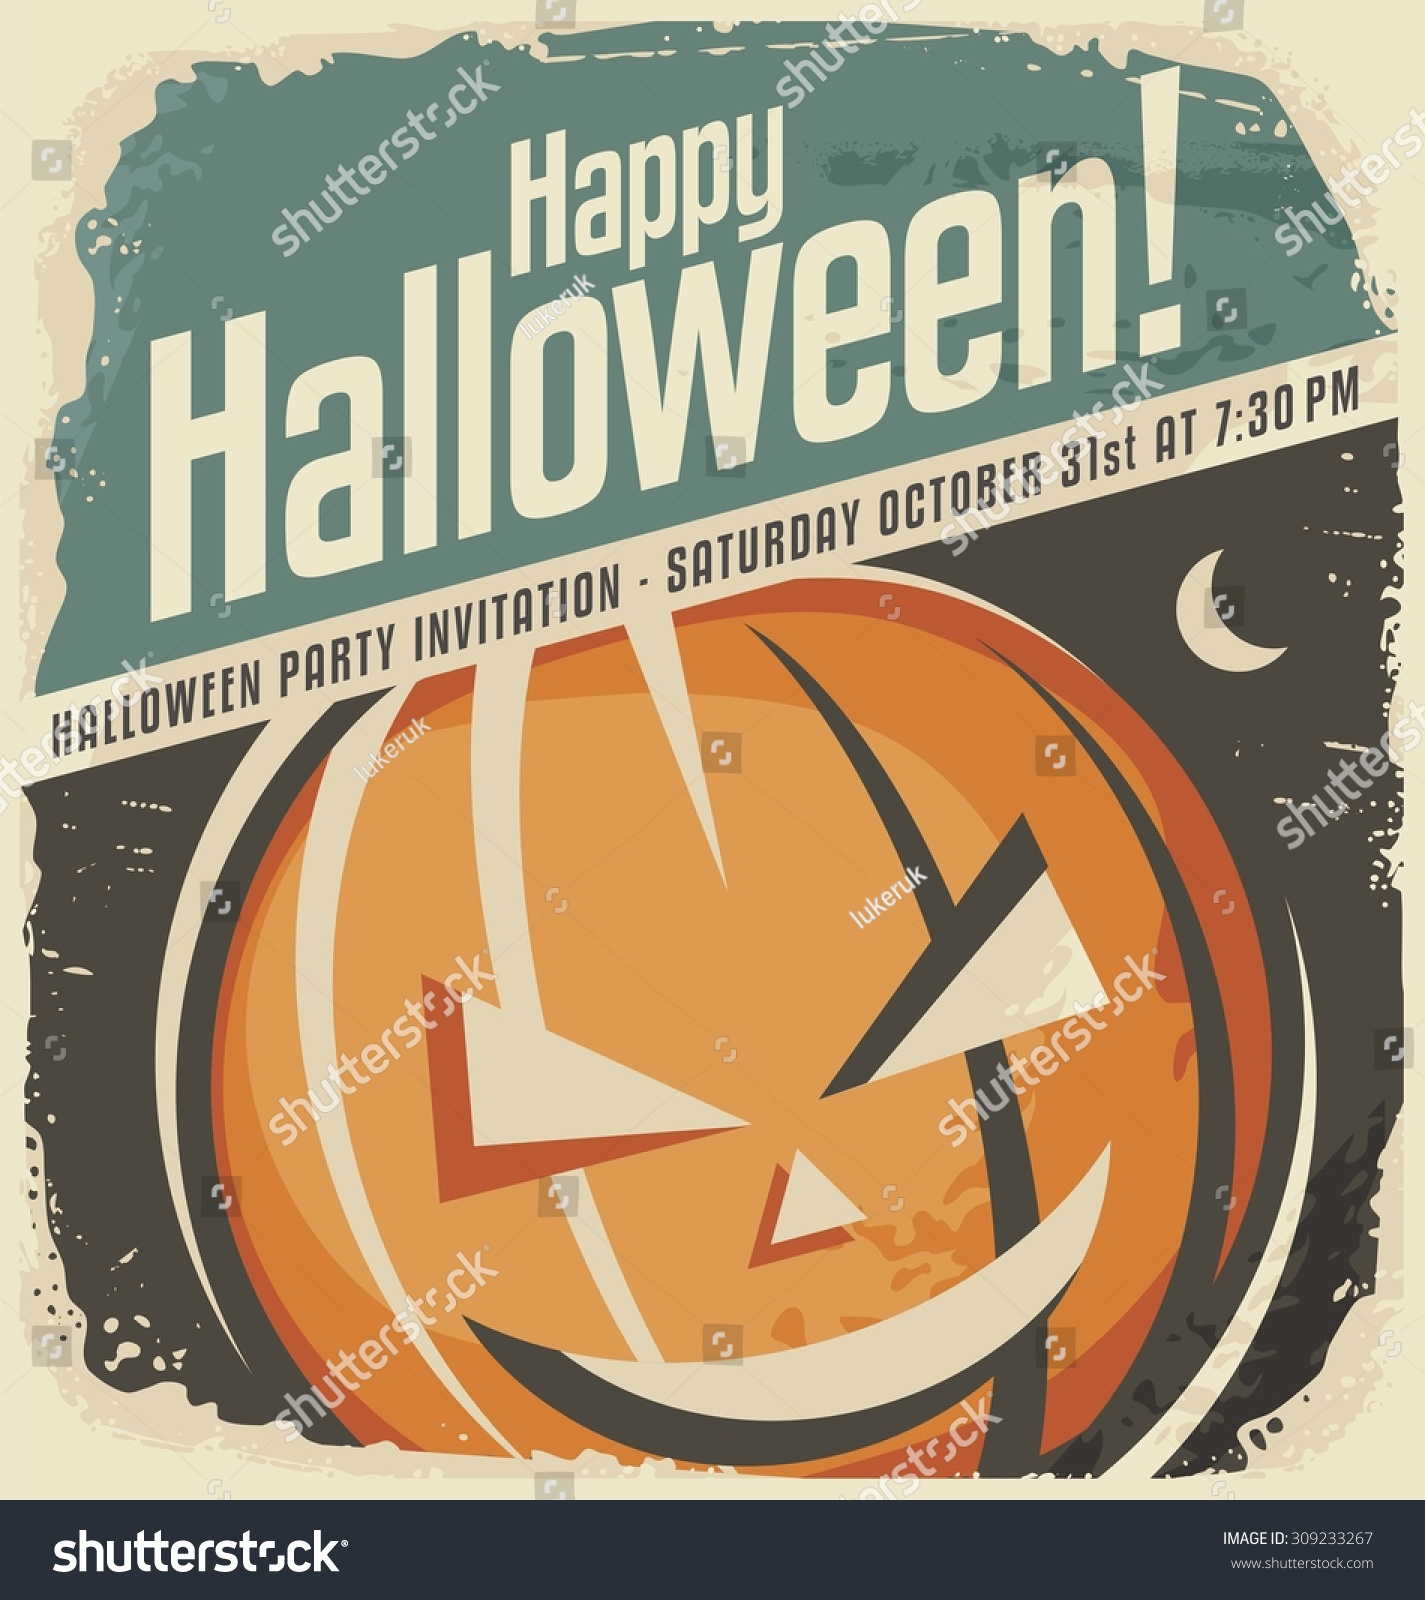 Retro Poster Template Halloween Pumpkin Head Stock Vector ...